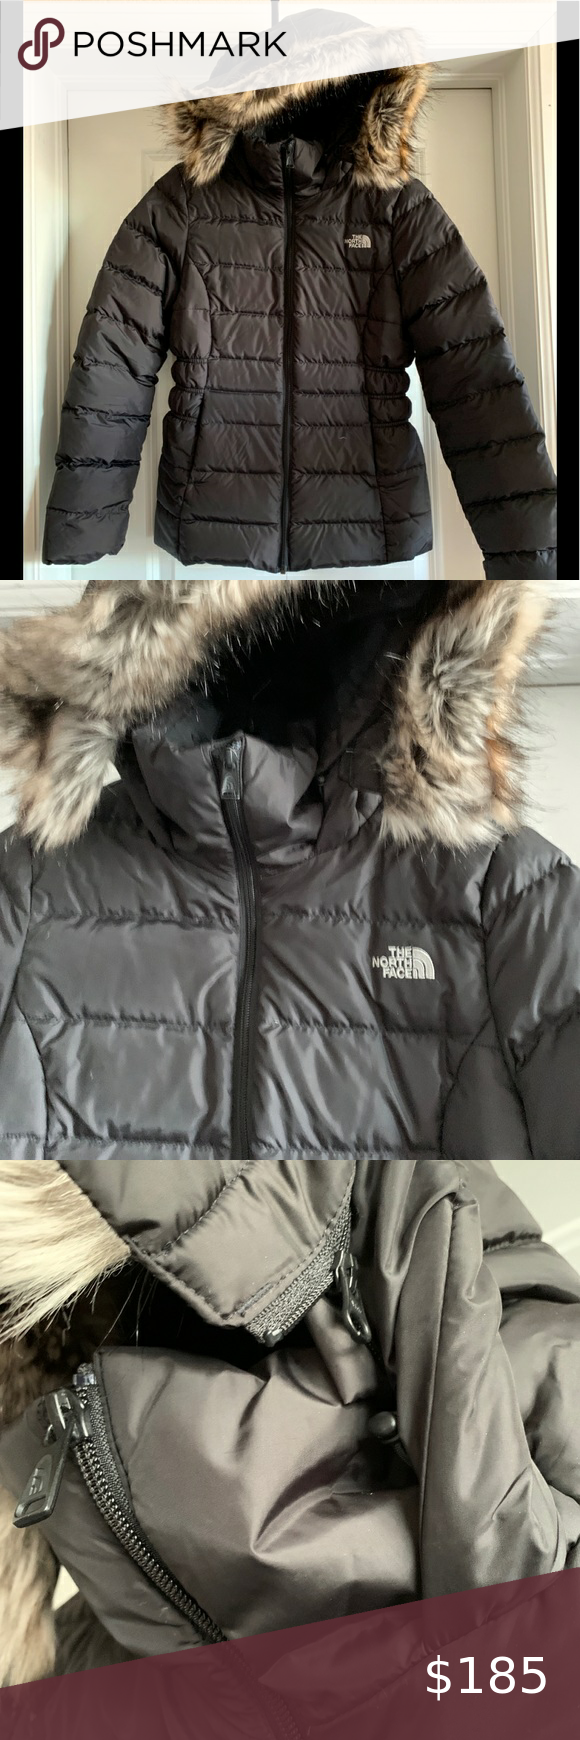 Nwt North Face Puffy W Detach Fur On Hood S North Face Fleece Jacket North Face Puffer Jacket Green Hooded Jacket [ 1740 x 580 Pixel ]